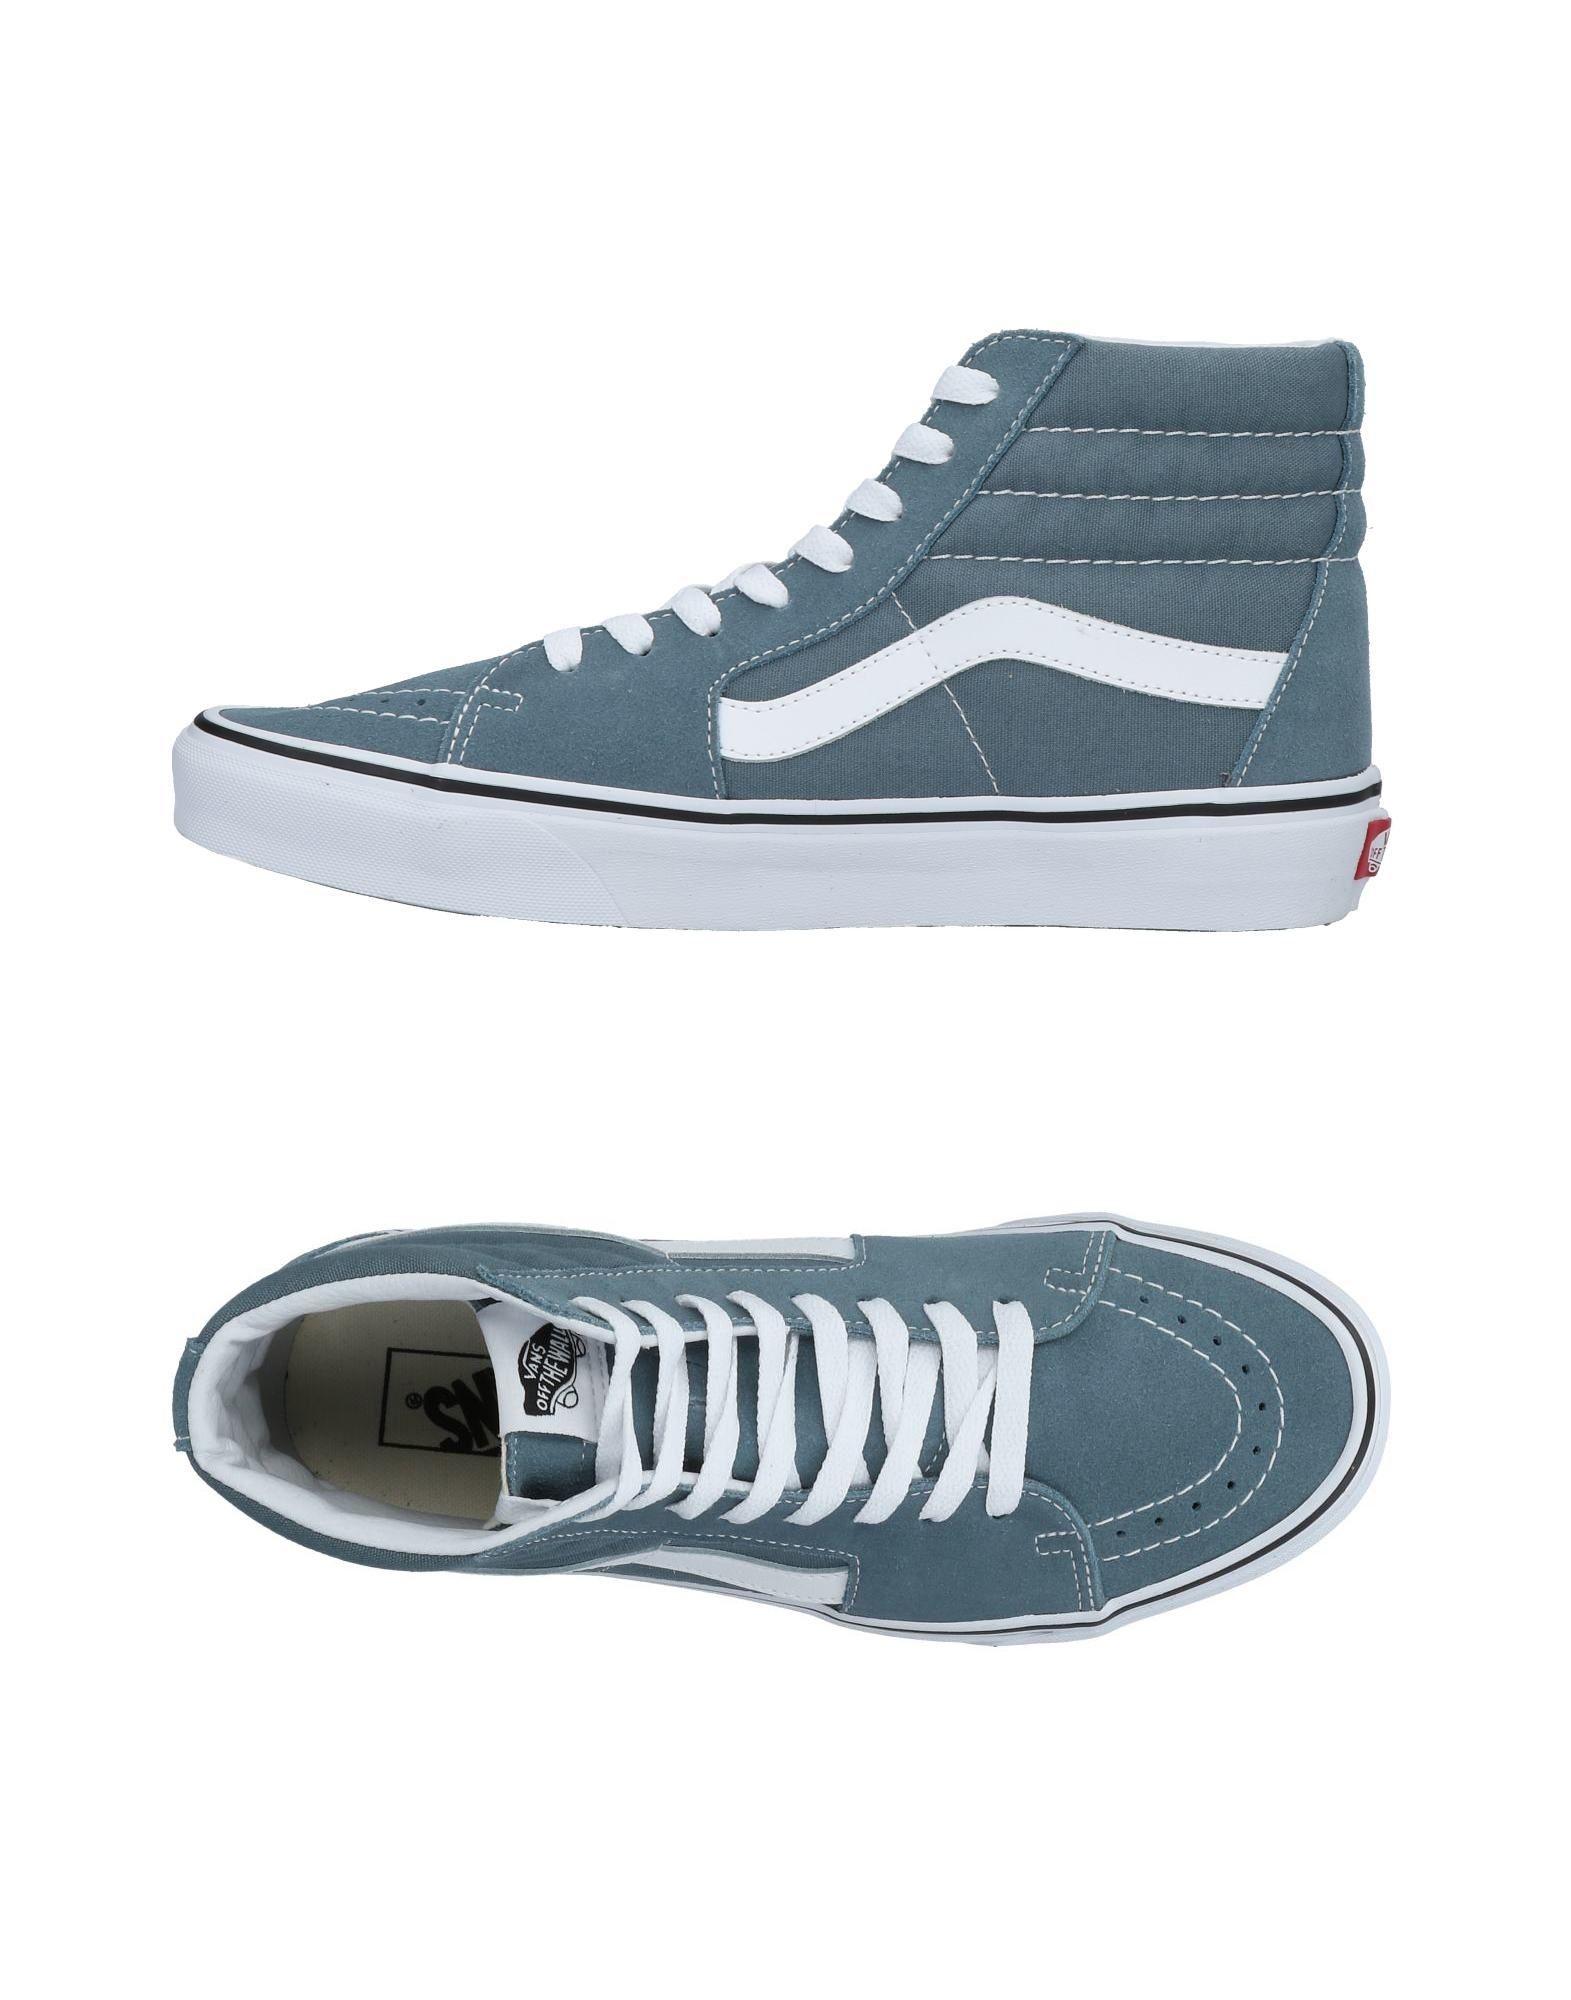 242f4dfe79 VANS ΠΑΠΟΥΤΣΙΑ Χαμηλά sneakers